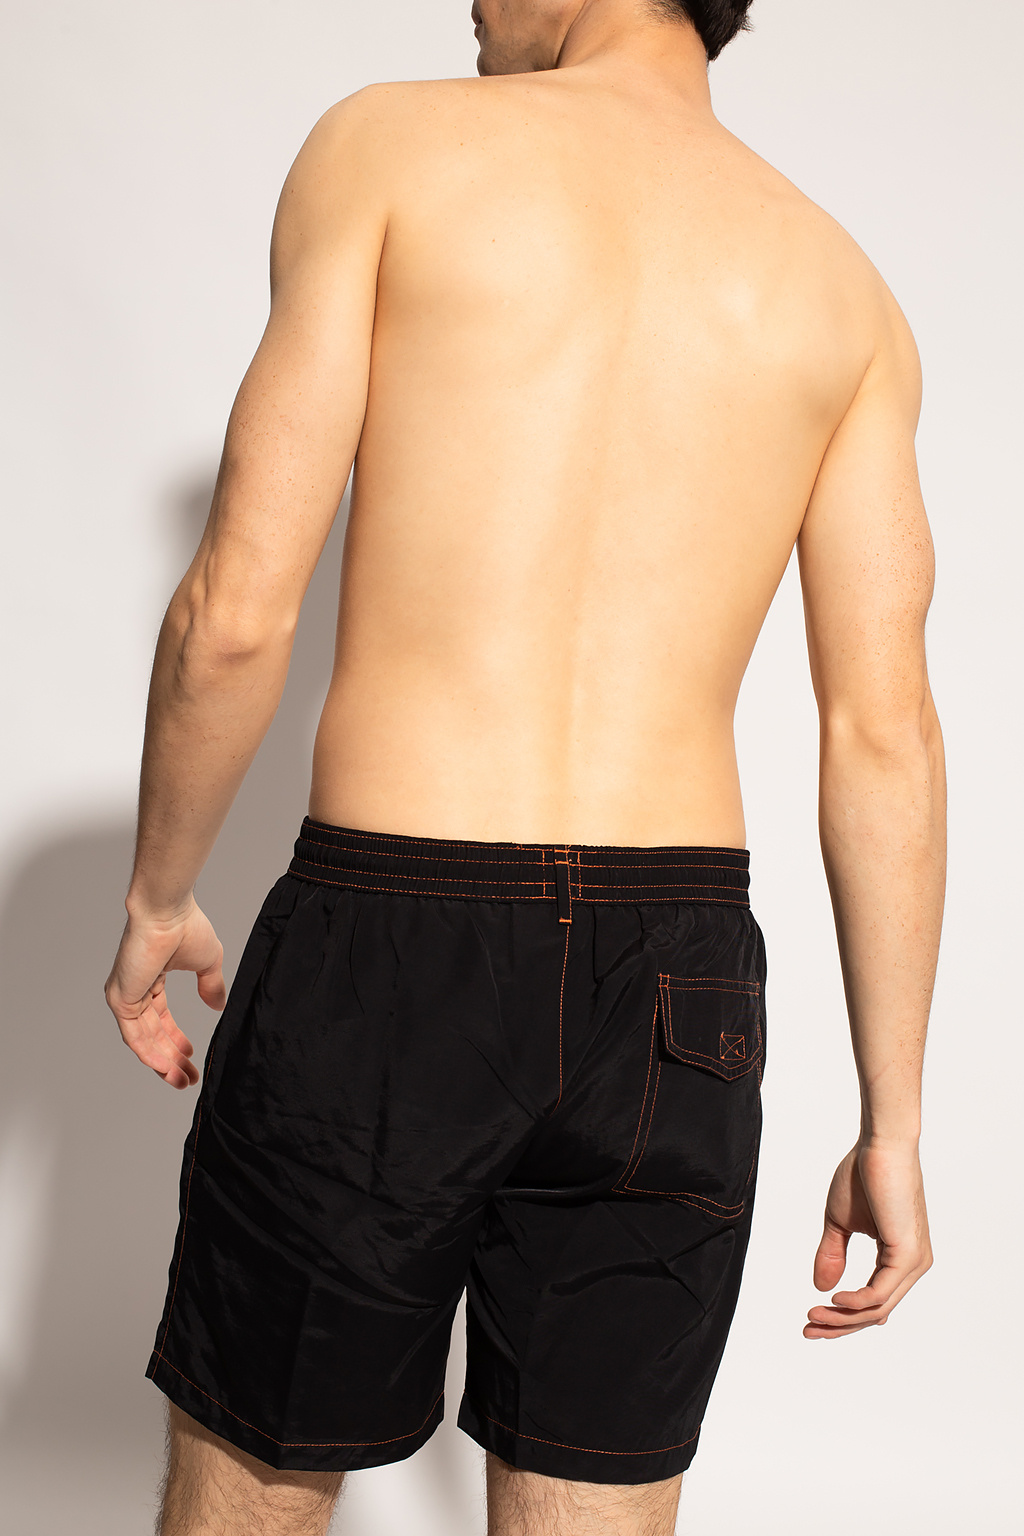 Paul Smith Swim shorts with logo